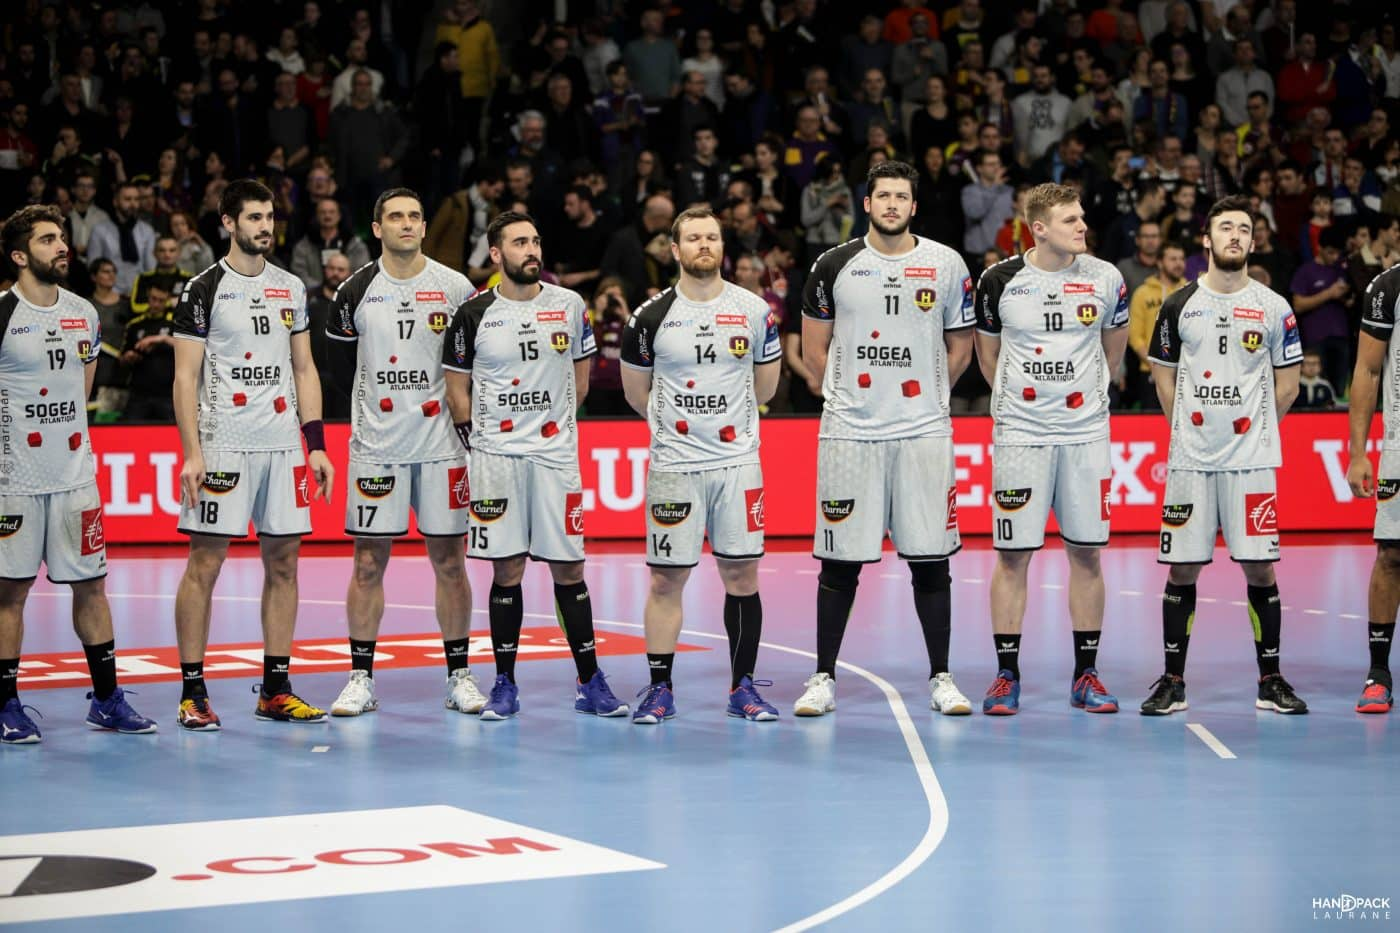 hbc-nantes-paris-saint-germain-handball-ligue-des-champions-2019-handpack-4